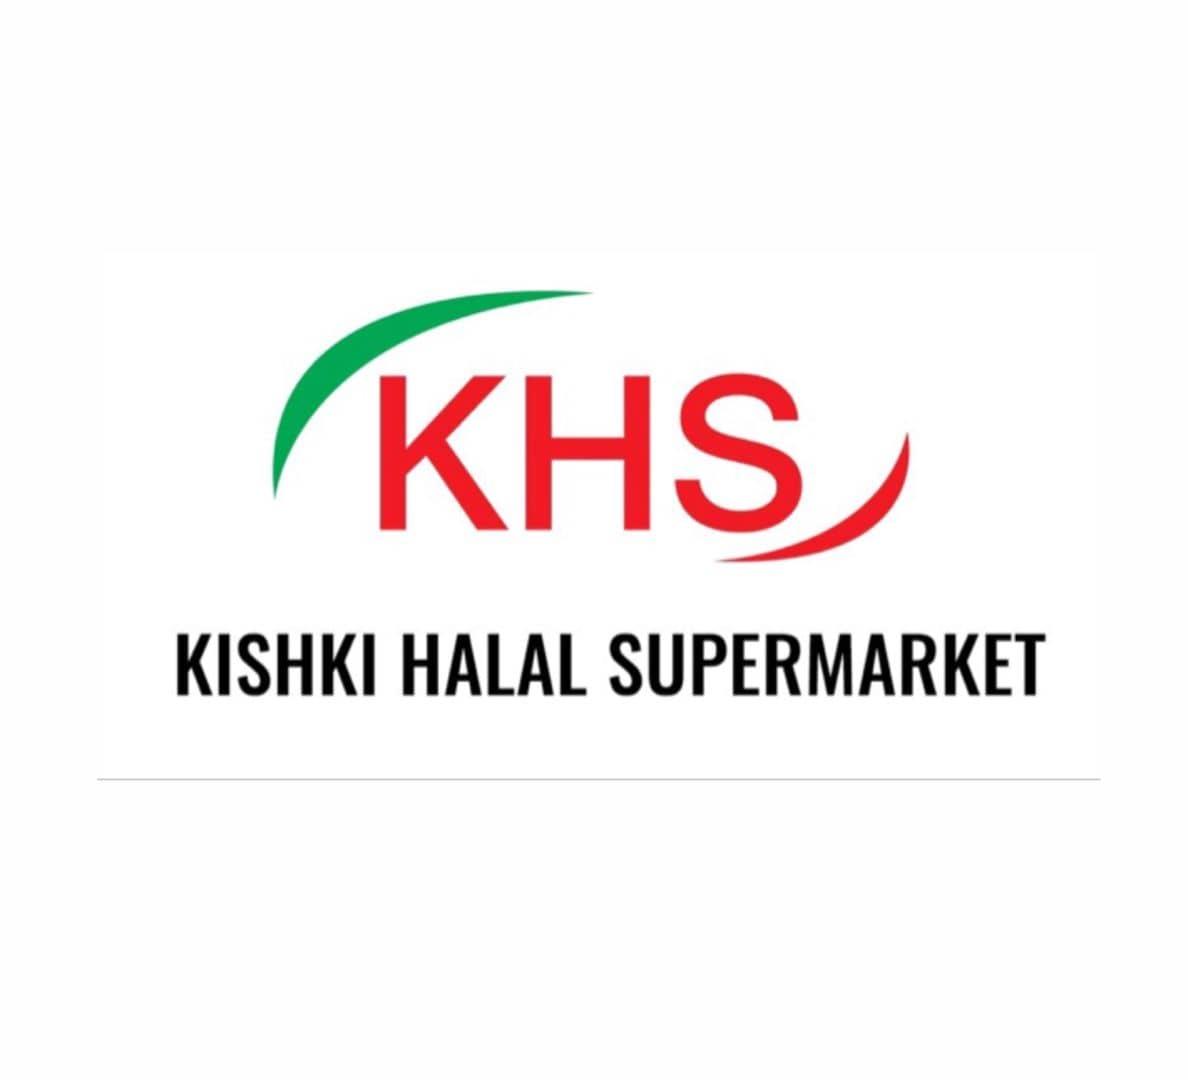 Kishki Halal Supermarket image